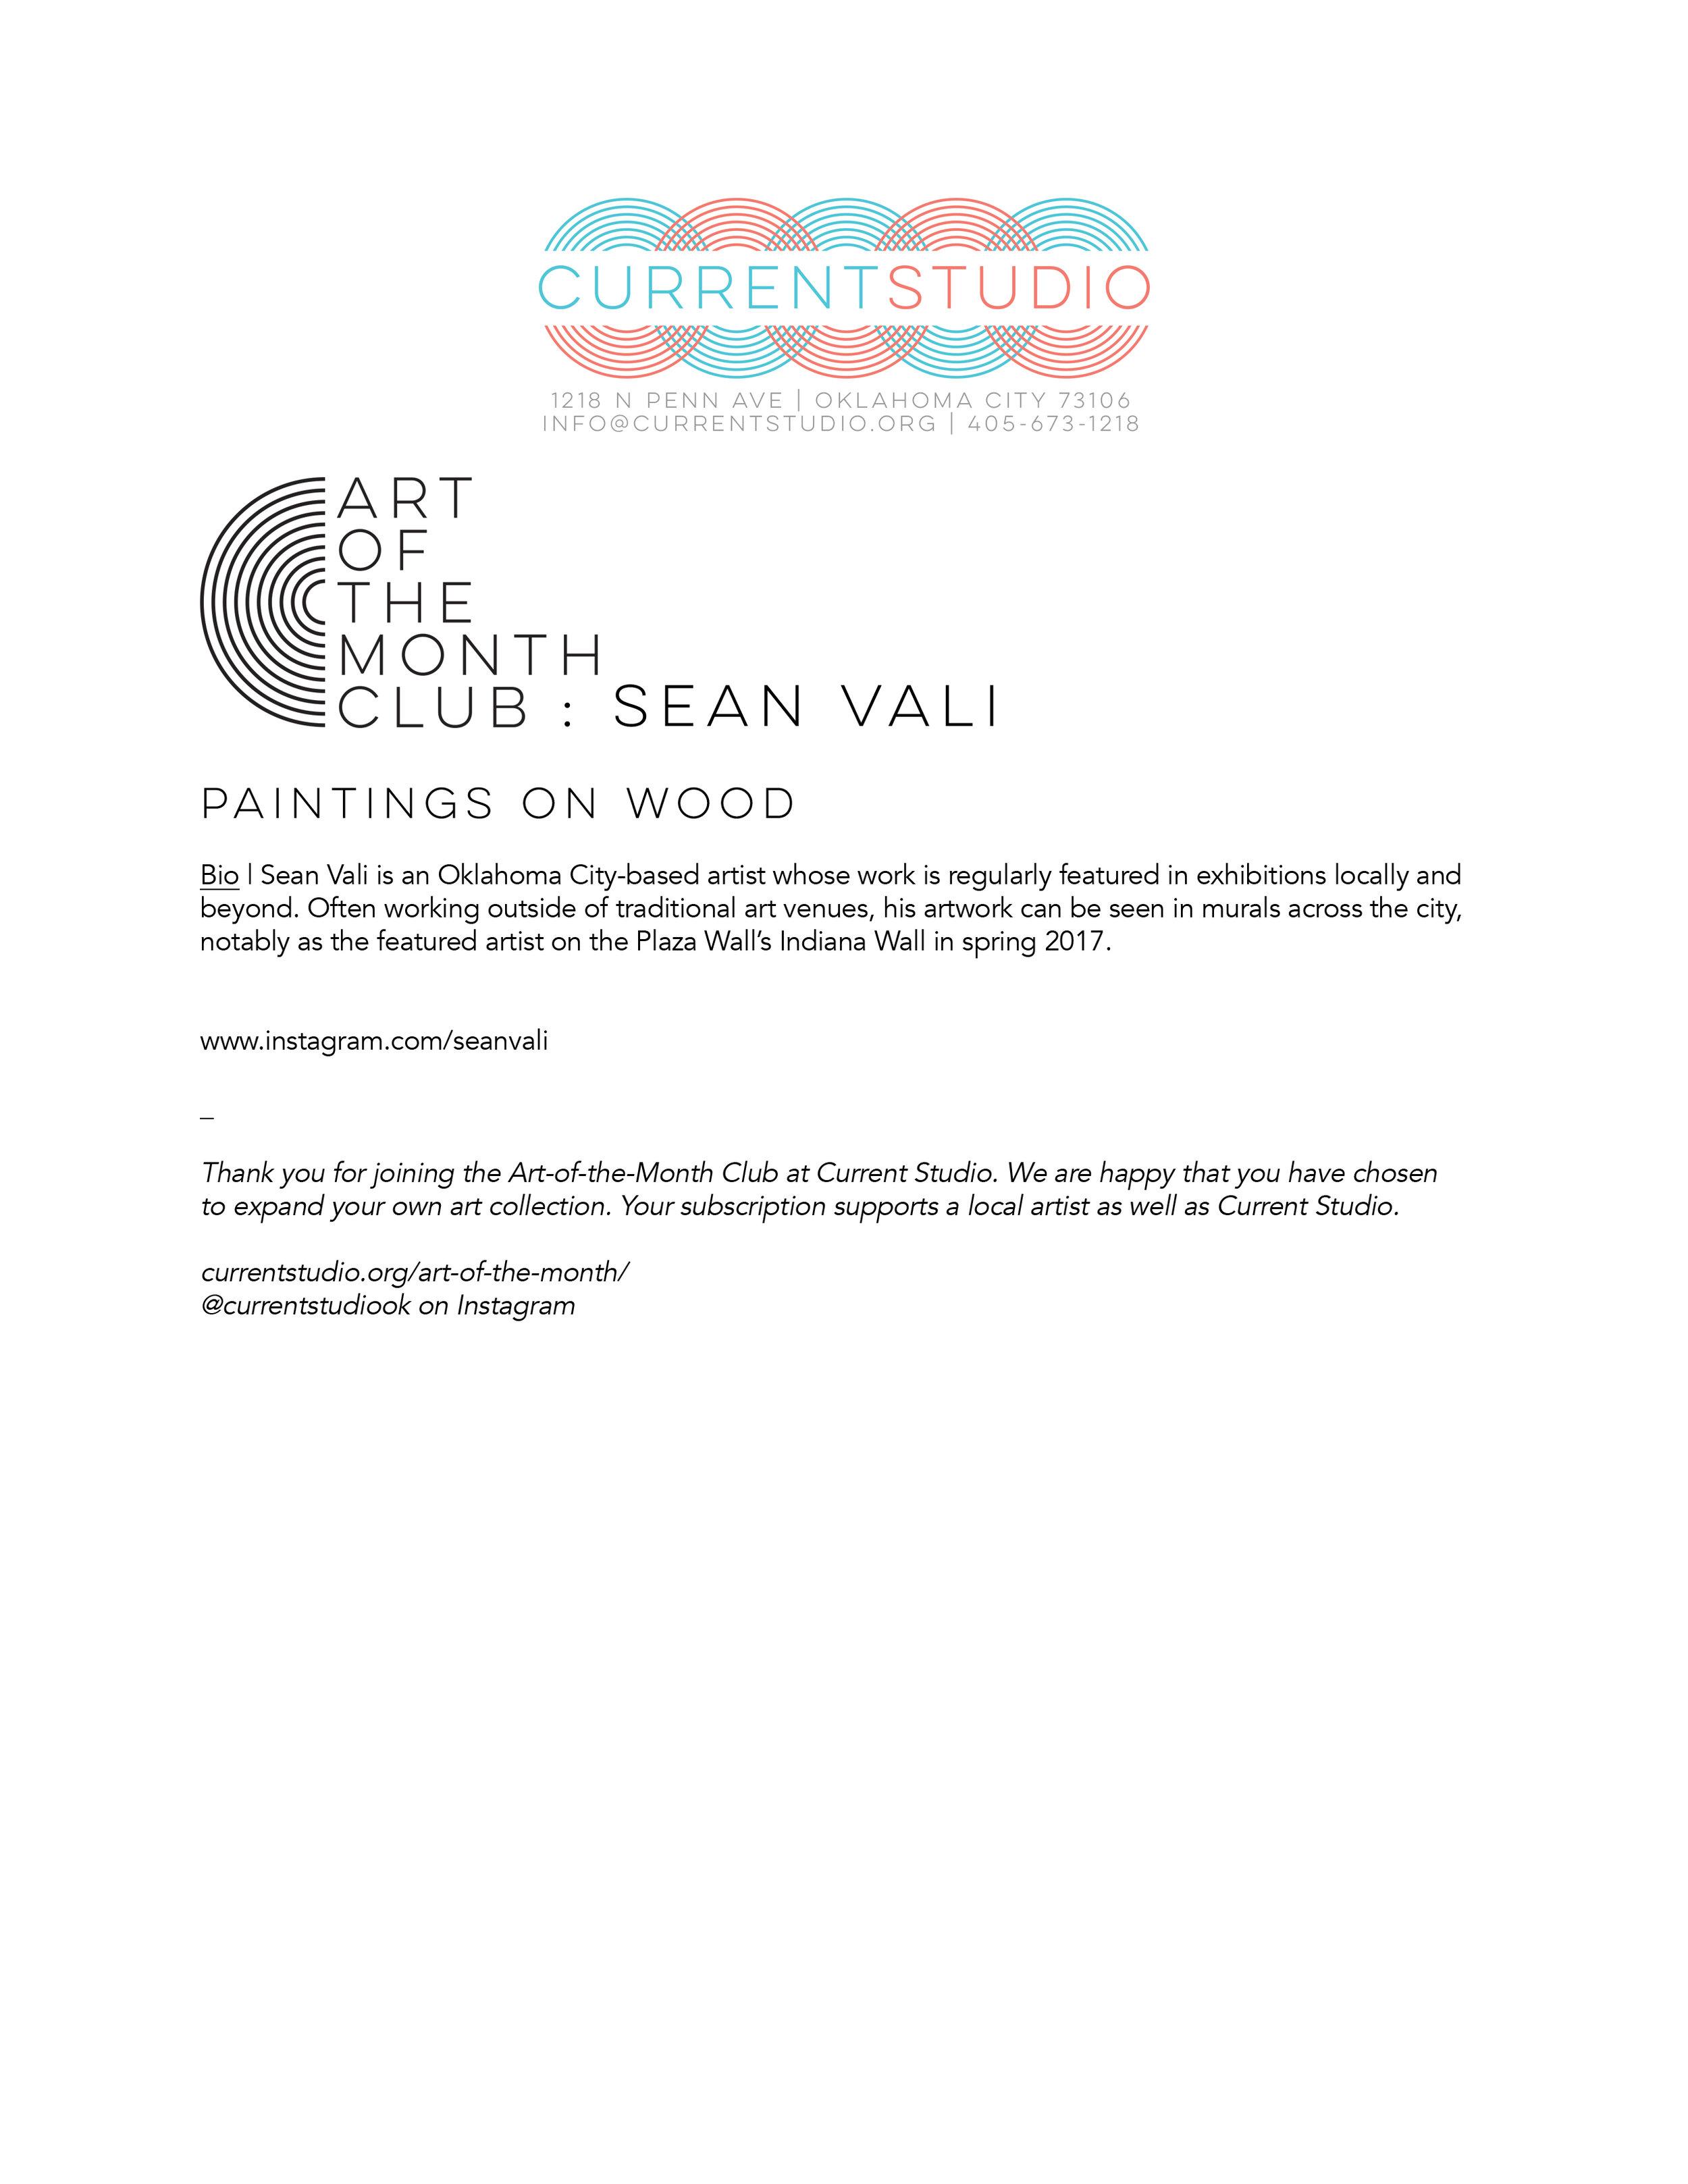 art of the month artist sheet - sean vali.jpg